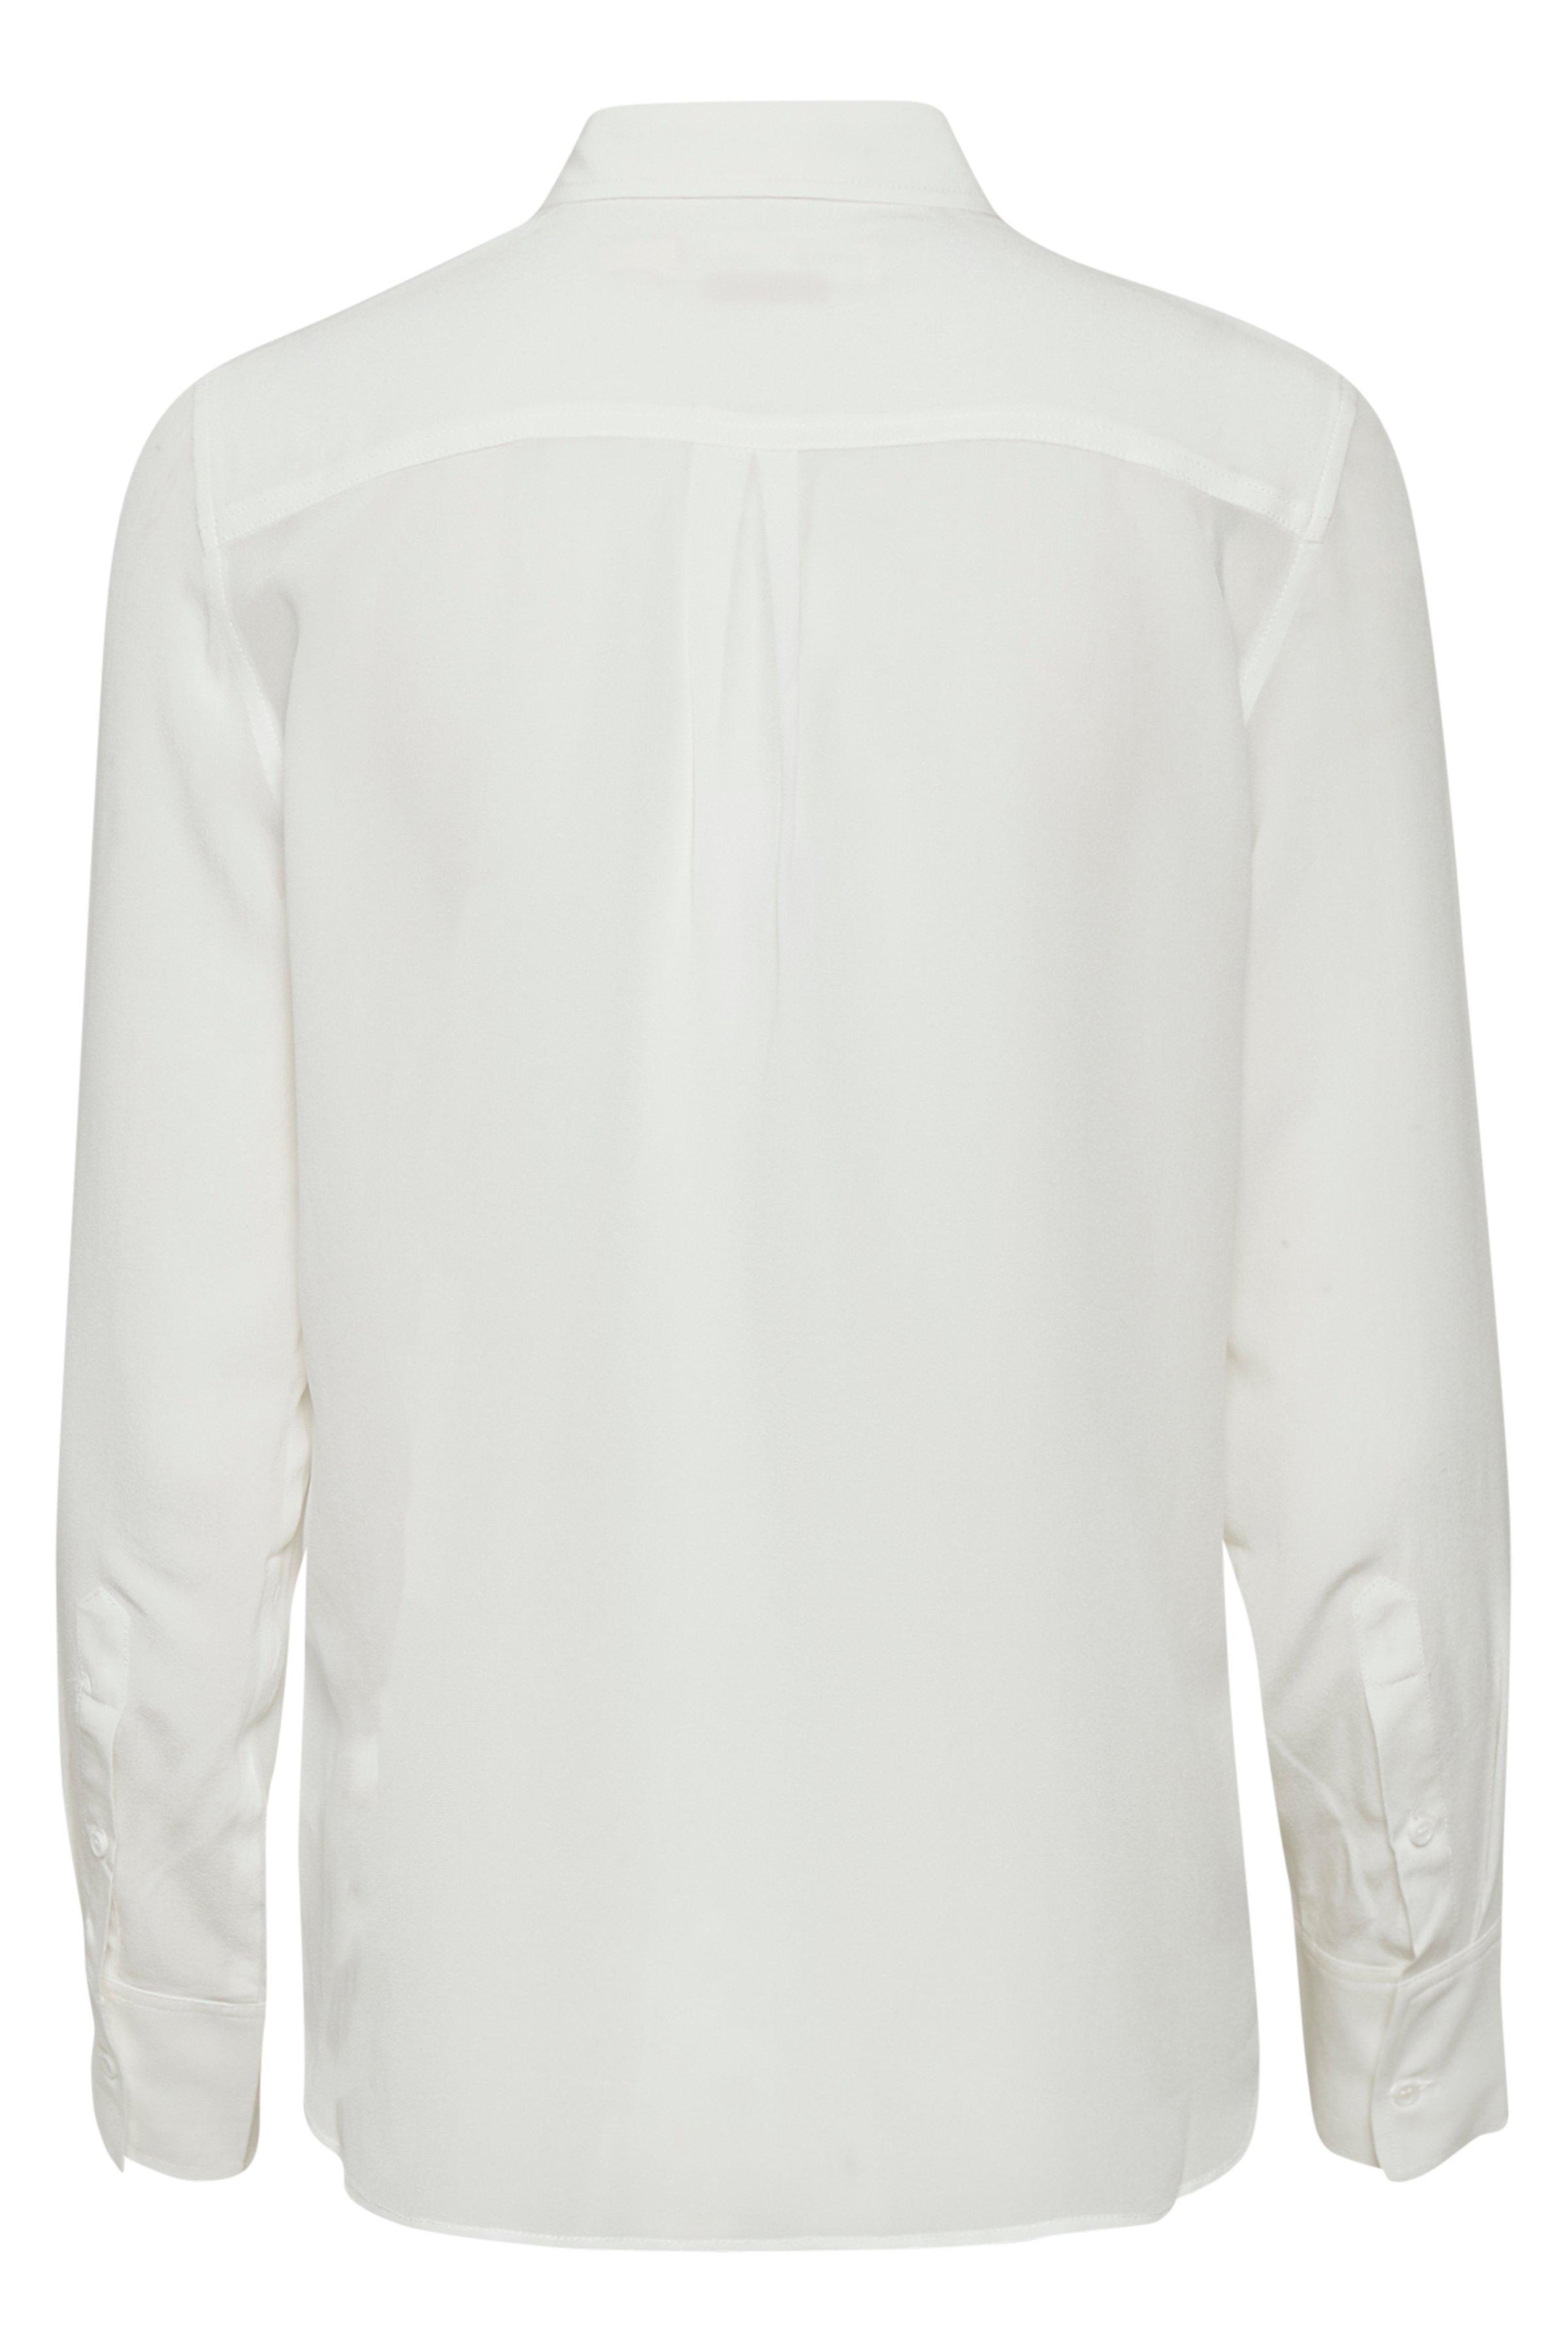 White Smoke Langærmet skjorte – Køb White Smoke Langærmet skjorte fra str. 34-44 her